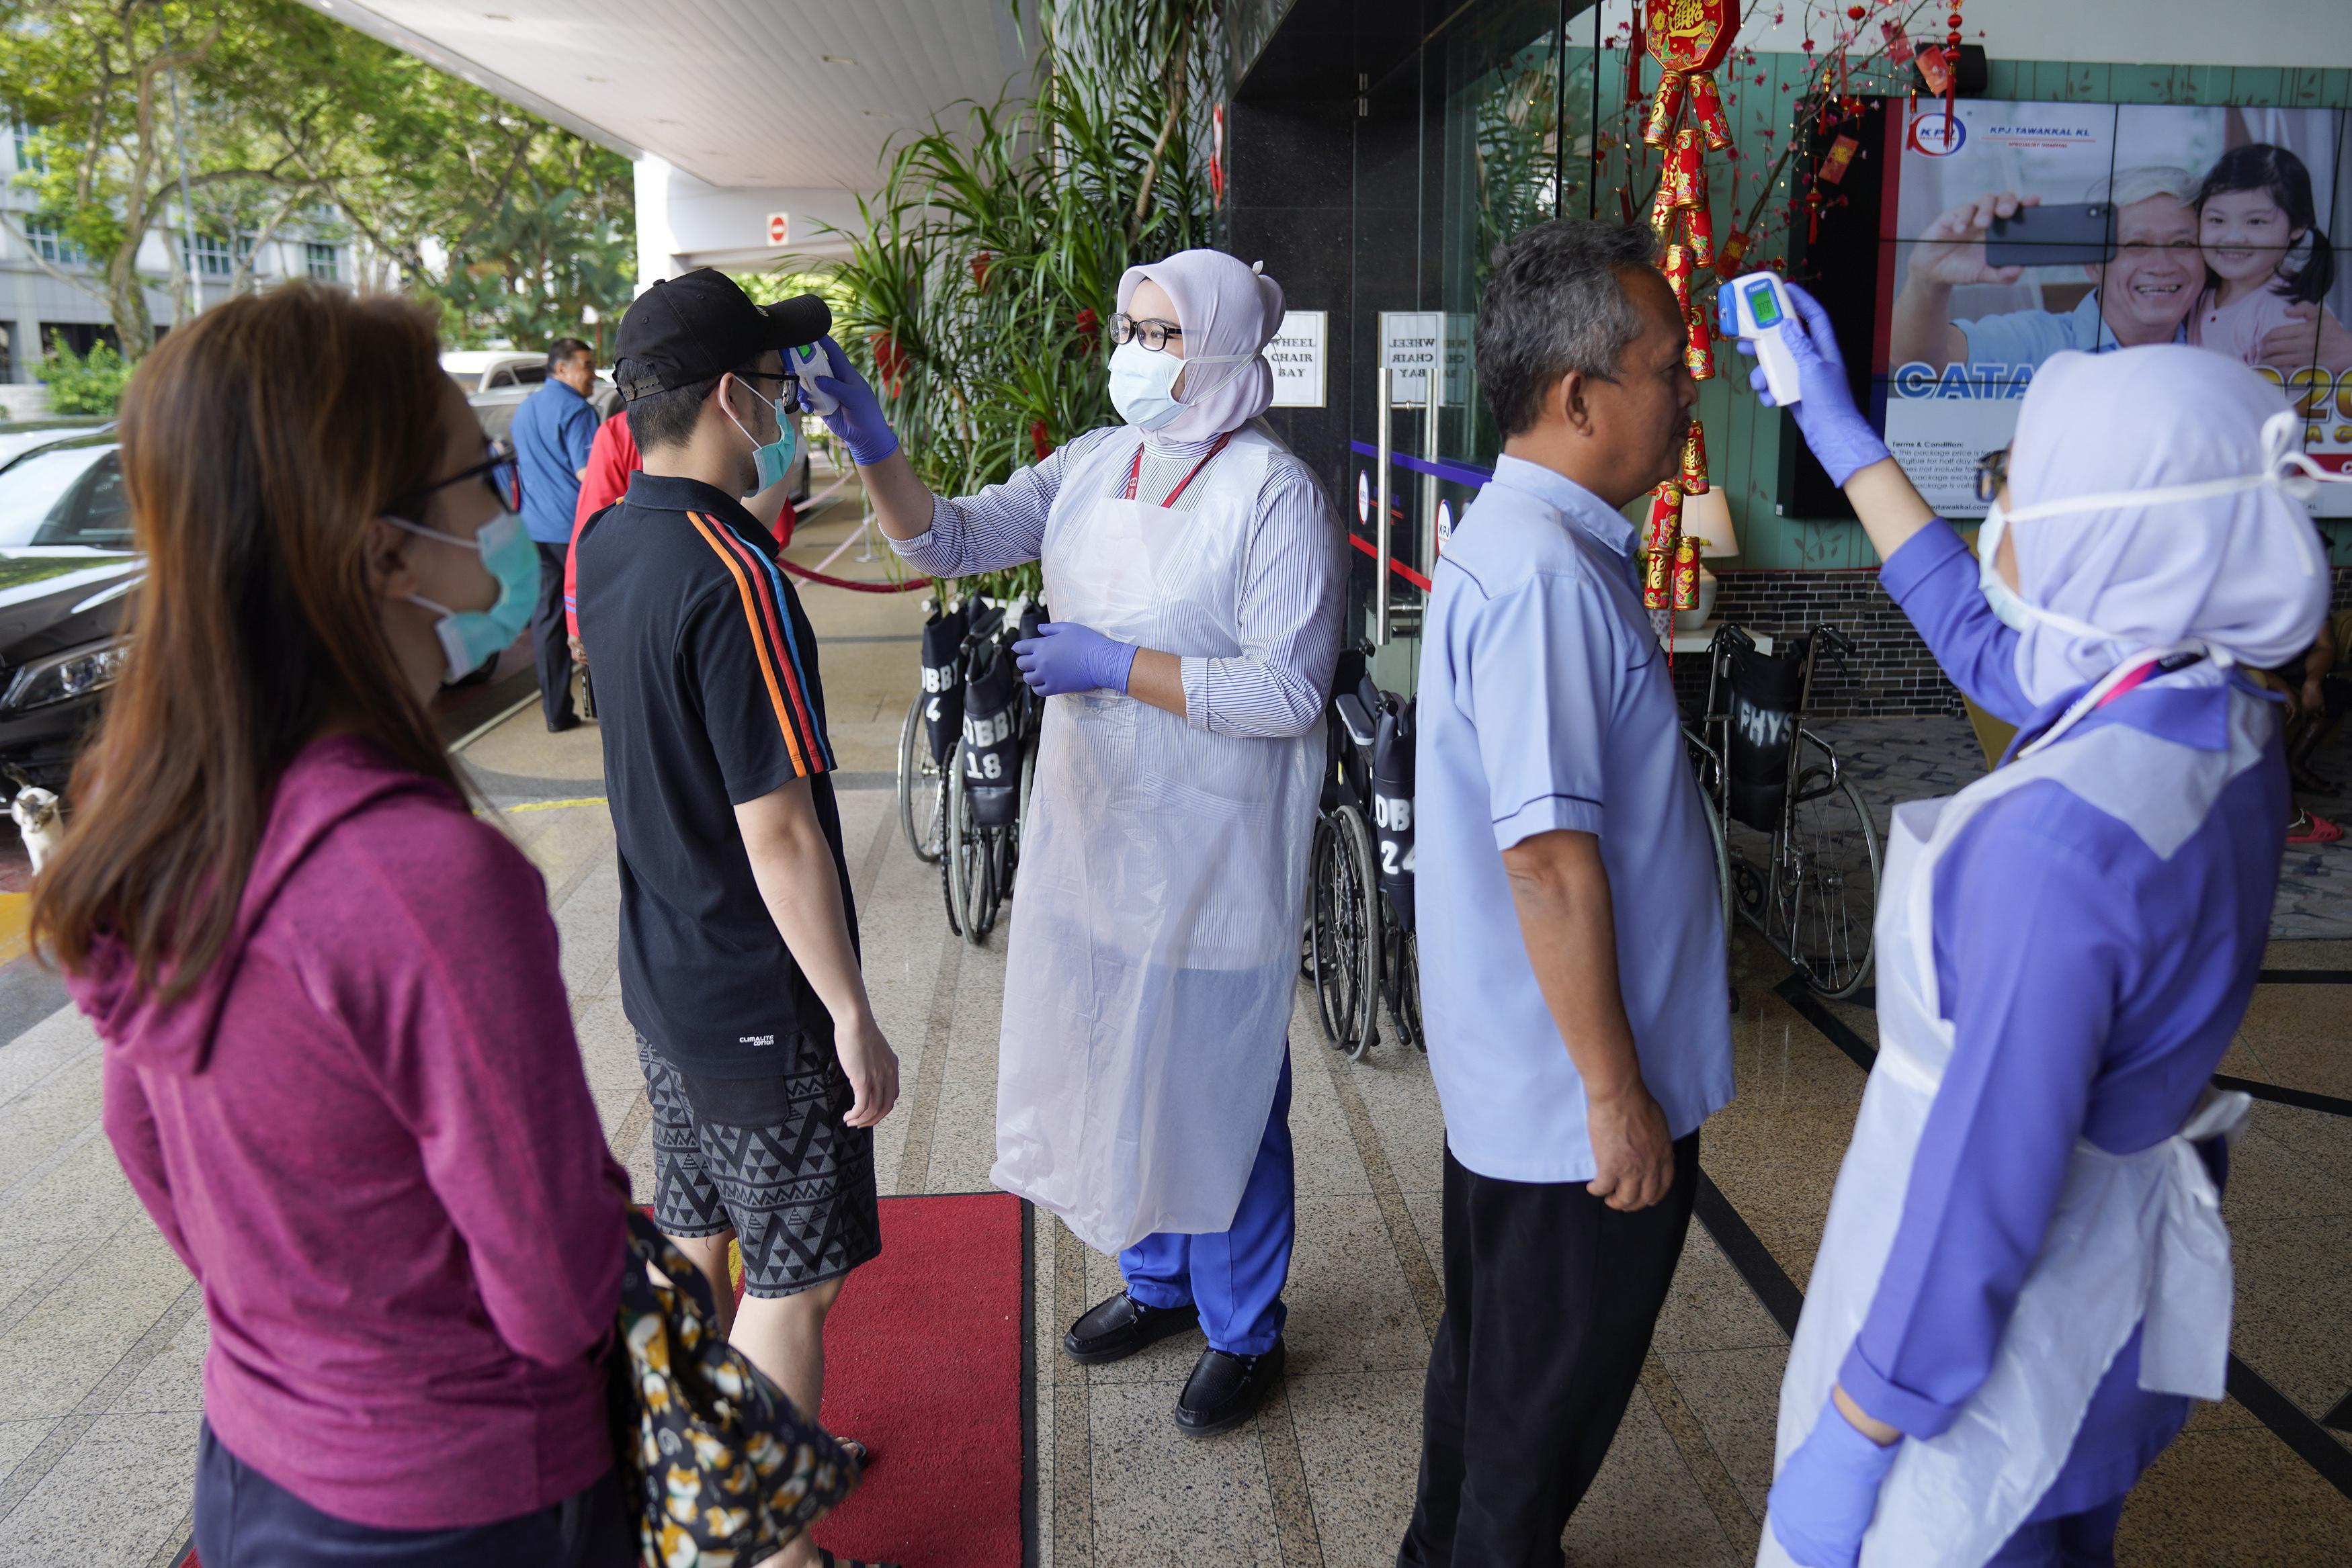 Nurses check the temperatures of visitors as part of the coronavirus screening procedure at a hospital in Kuala Lumpur, Malaysia